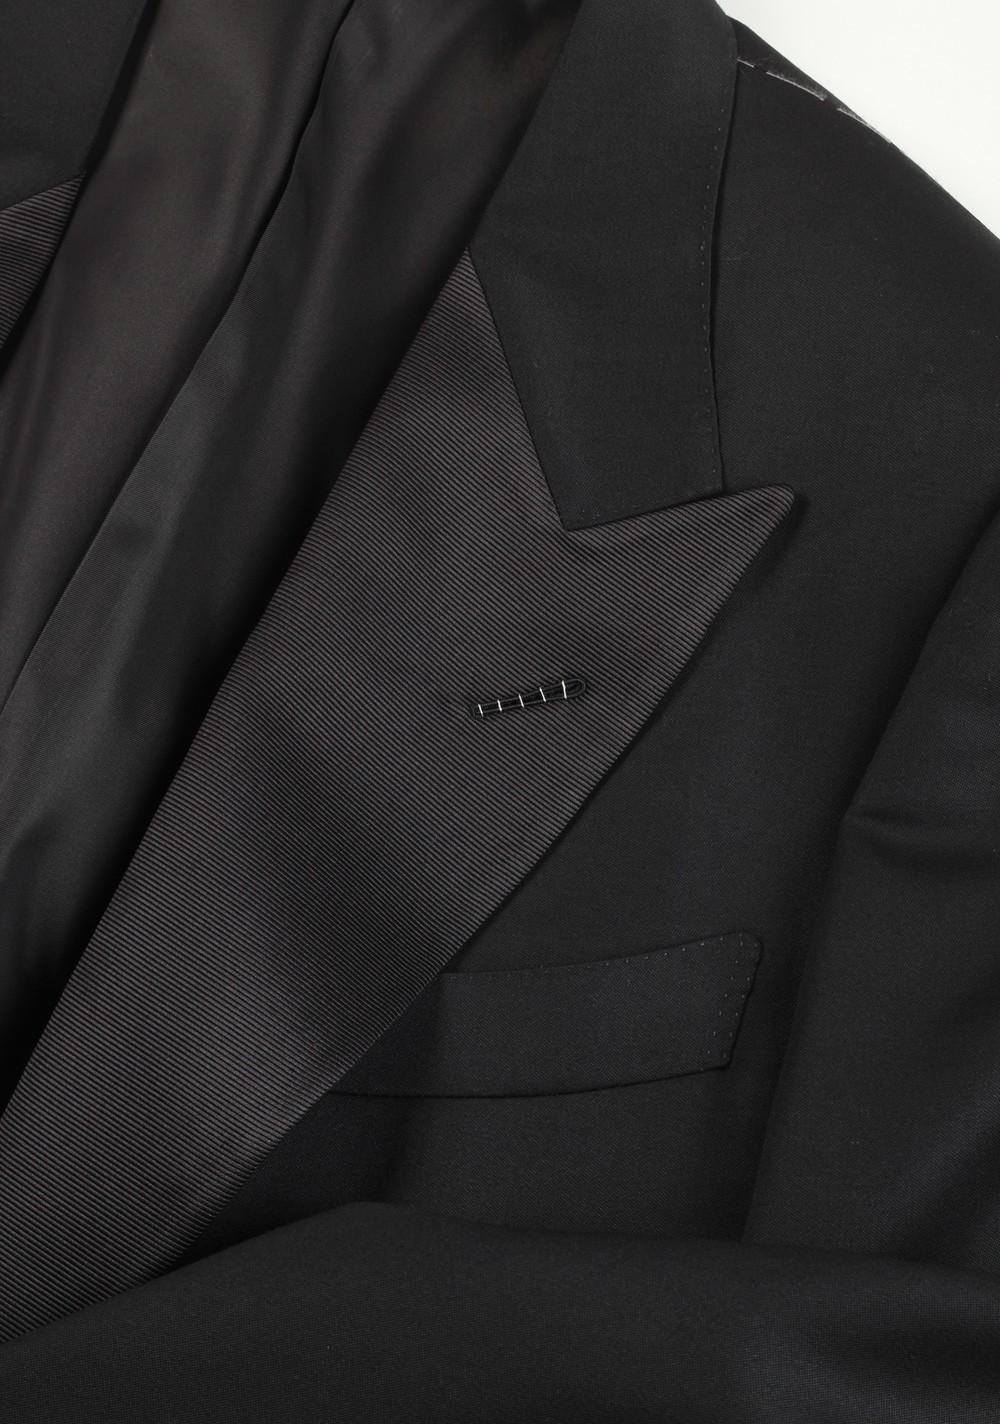 TOM FORD Windsor Black Tuxedo Smoking Suit Size 62L / 52L U.S. Base A | Costume Limité